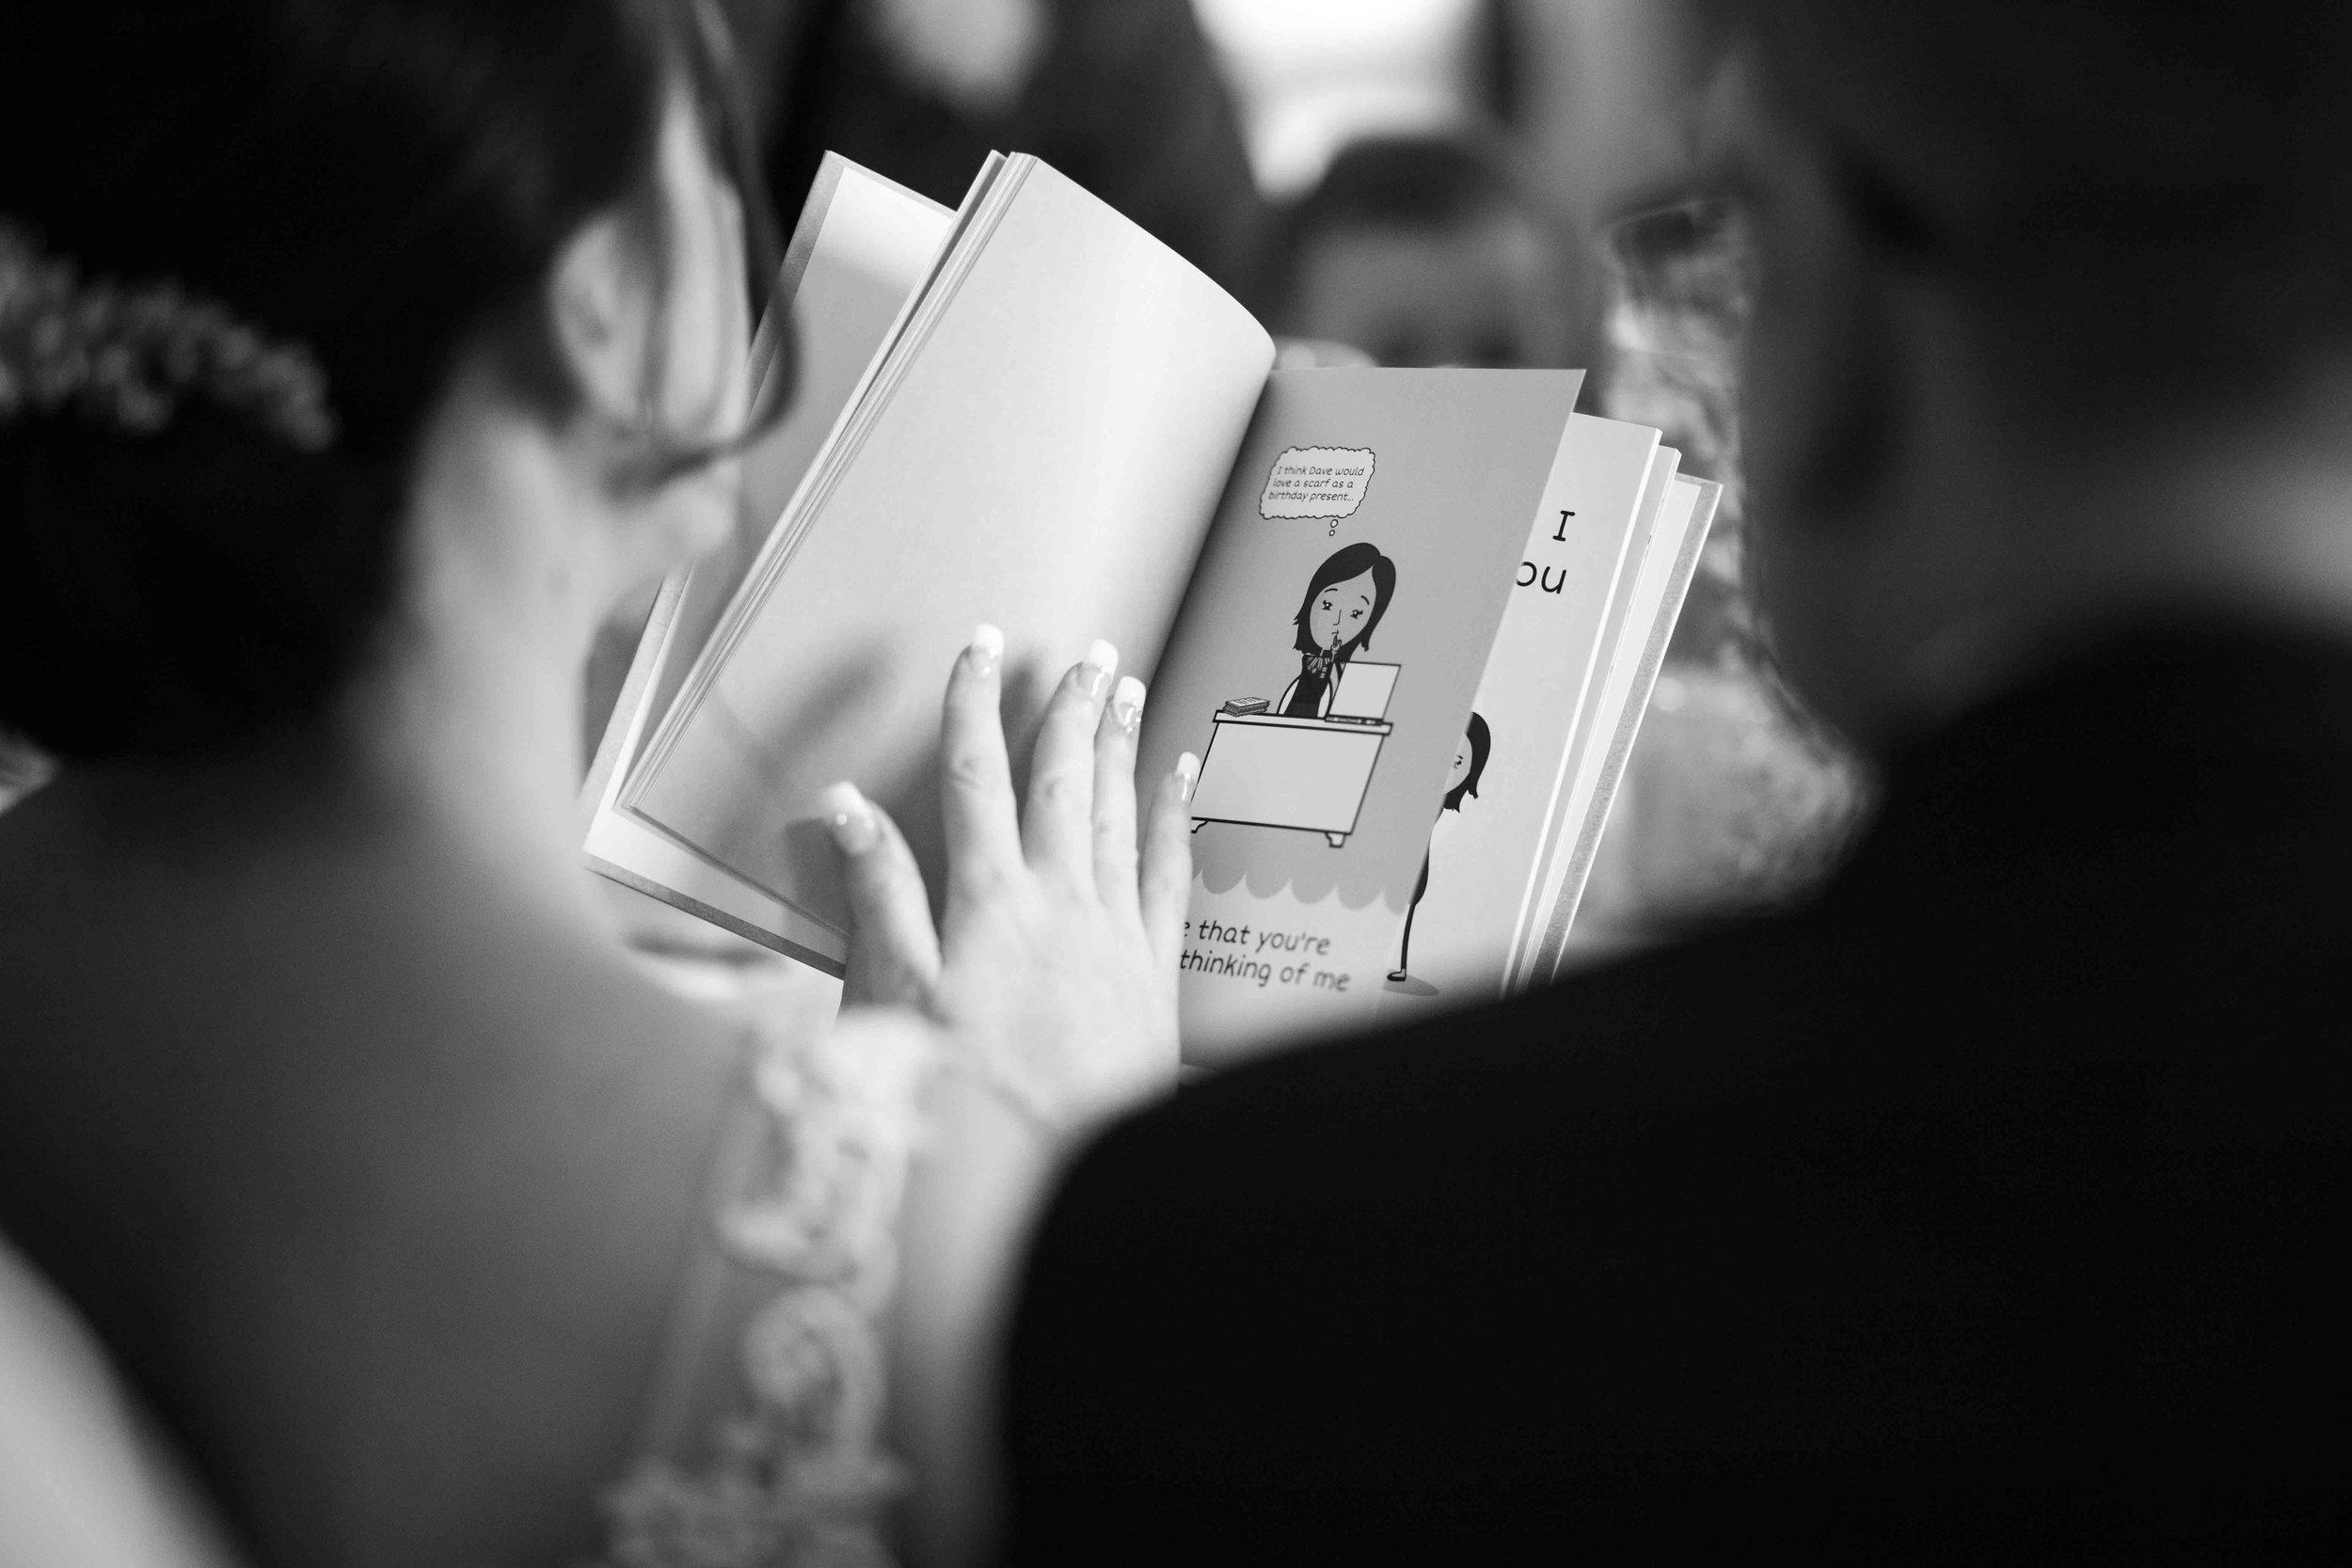 wedding-photos-willenhall-wedding-photographer-wolverhampton-wedding-photographer-west-midlands-wedding-photographer-birmingham-inside-of-present-book.jpg